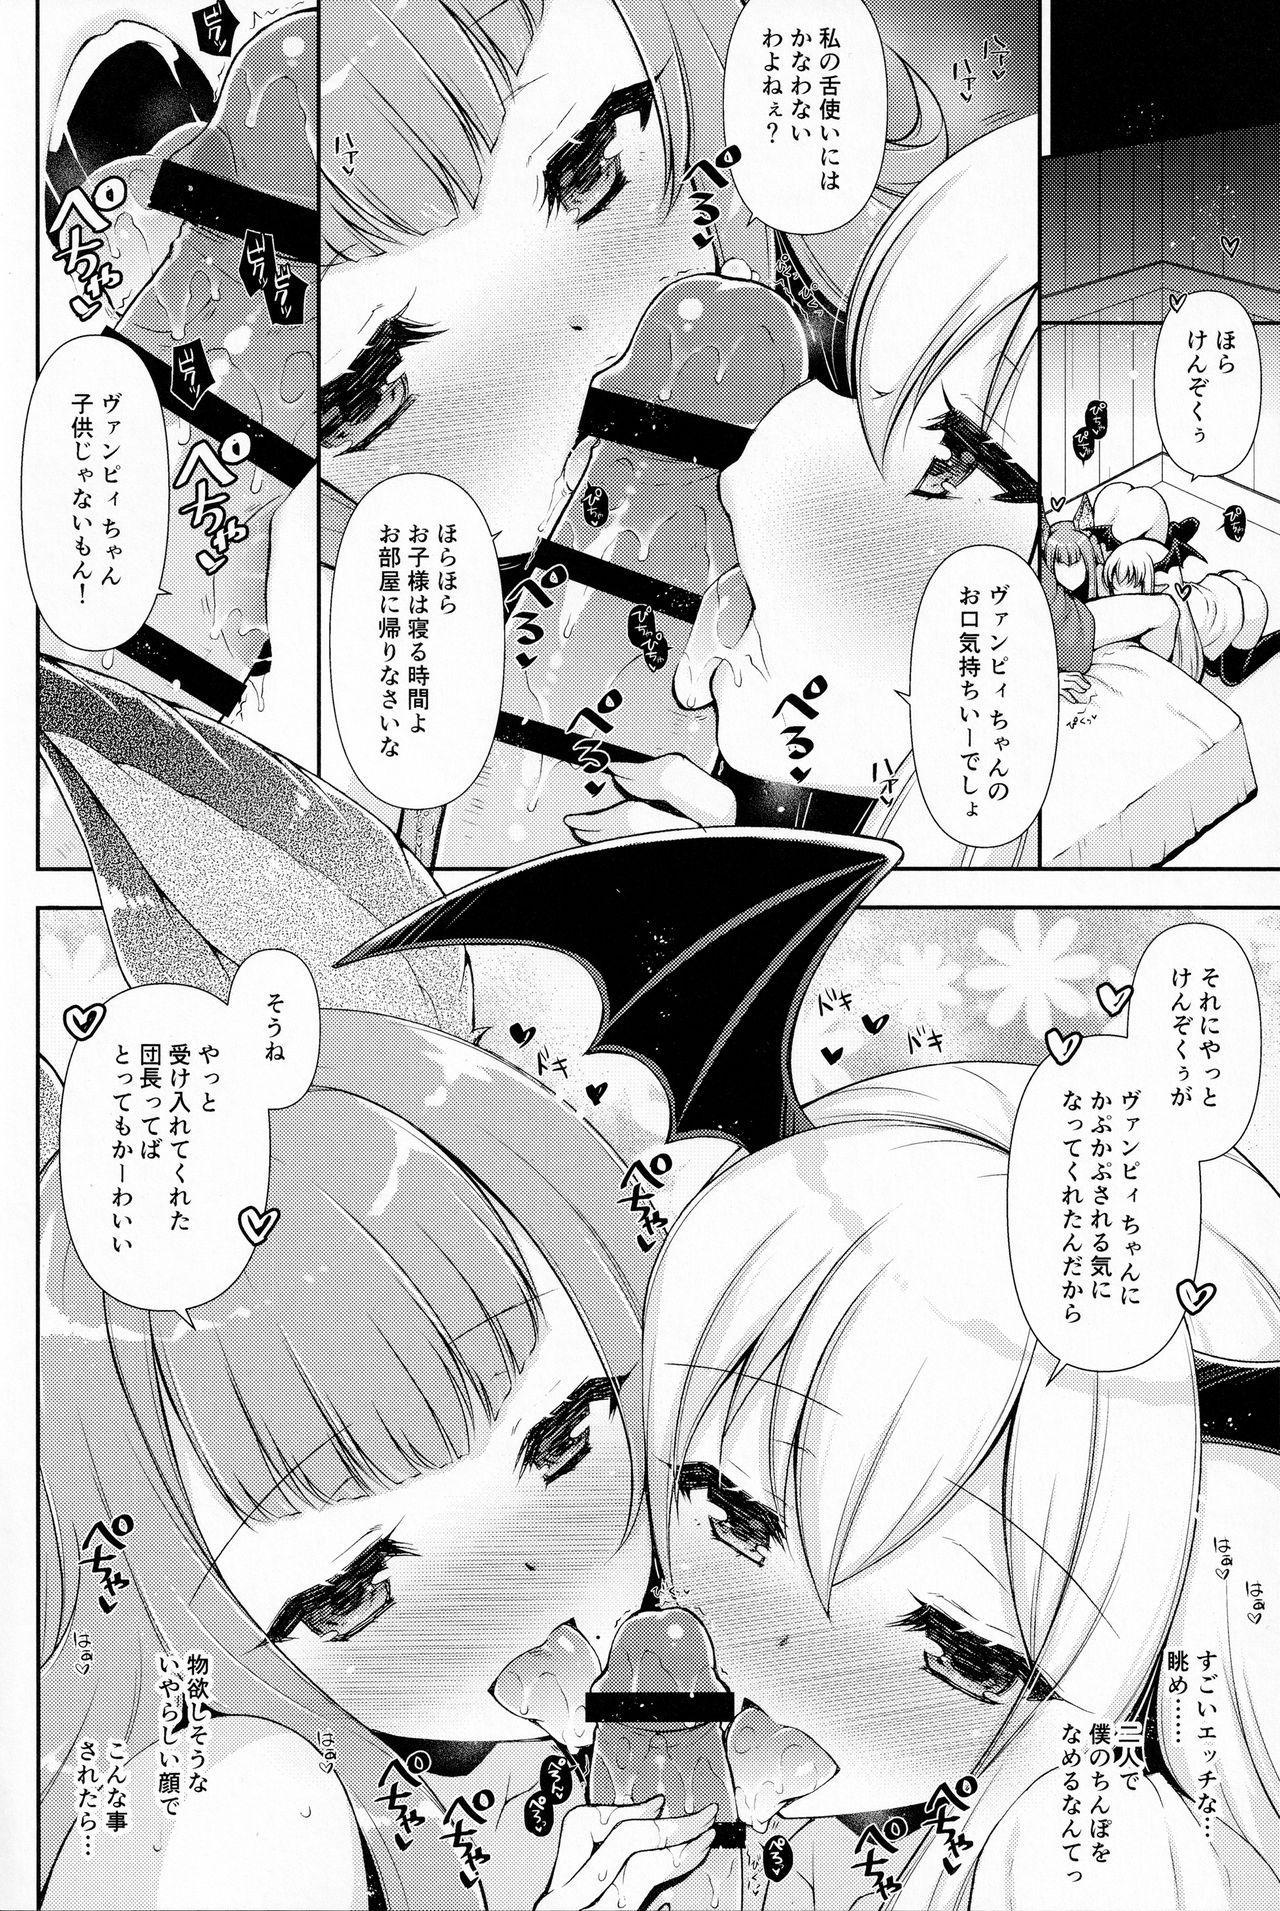 (COMIC1☆17) [Shigunyan (Shigunyan)] Onee-chan-tachi ni Amaete ne 2 (Granblue Fantasy) 6